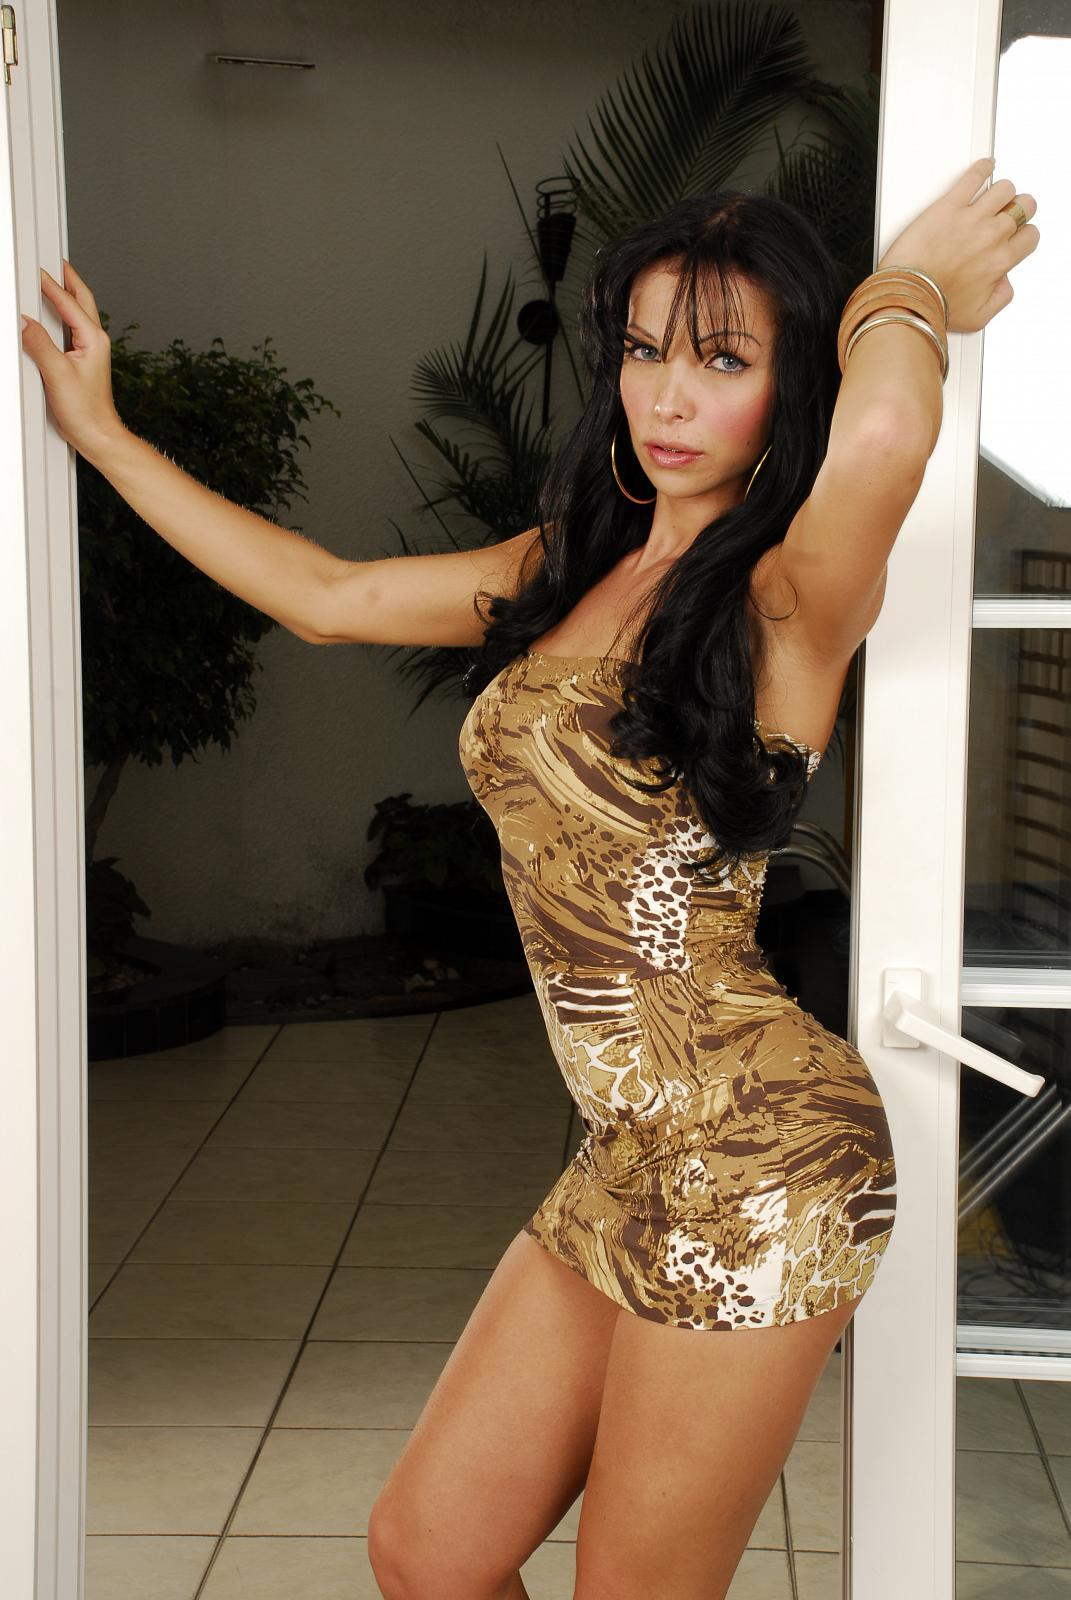 Steamy Latina TGirl Carla Novaes Sucks Dick And Has Rough